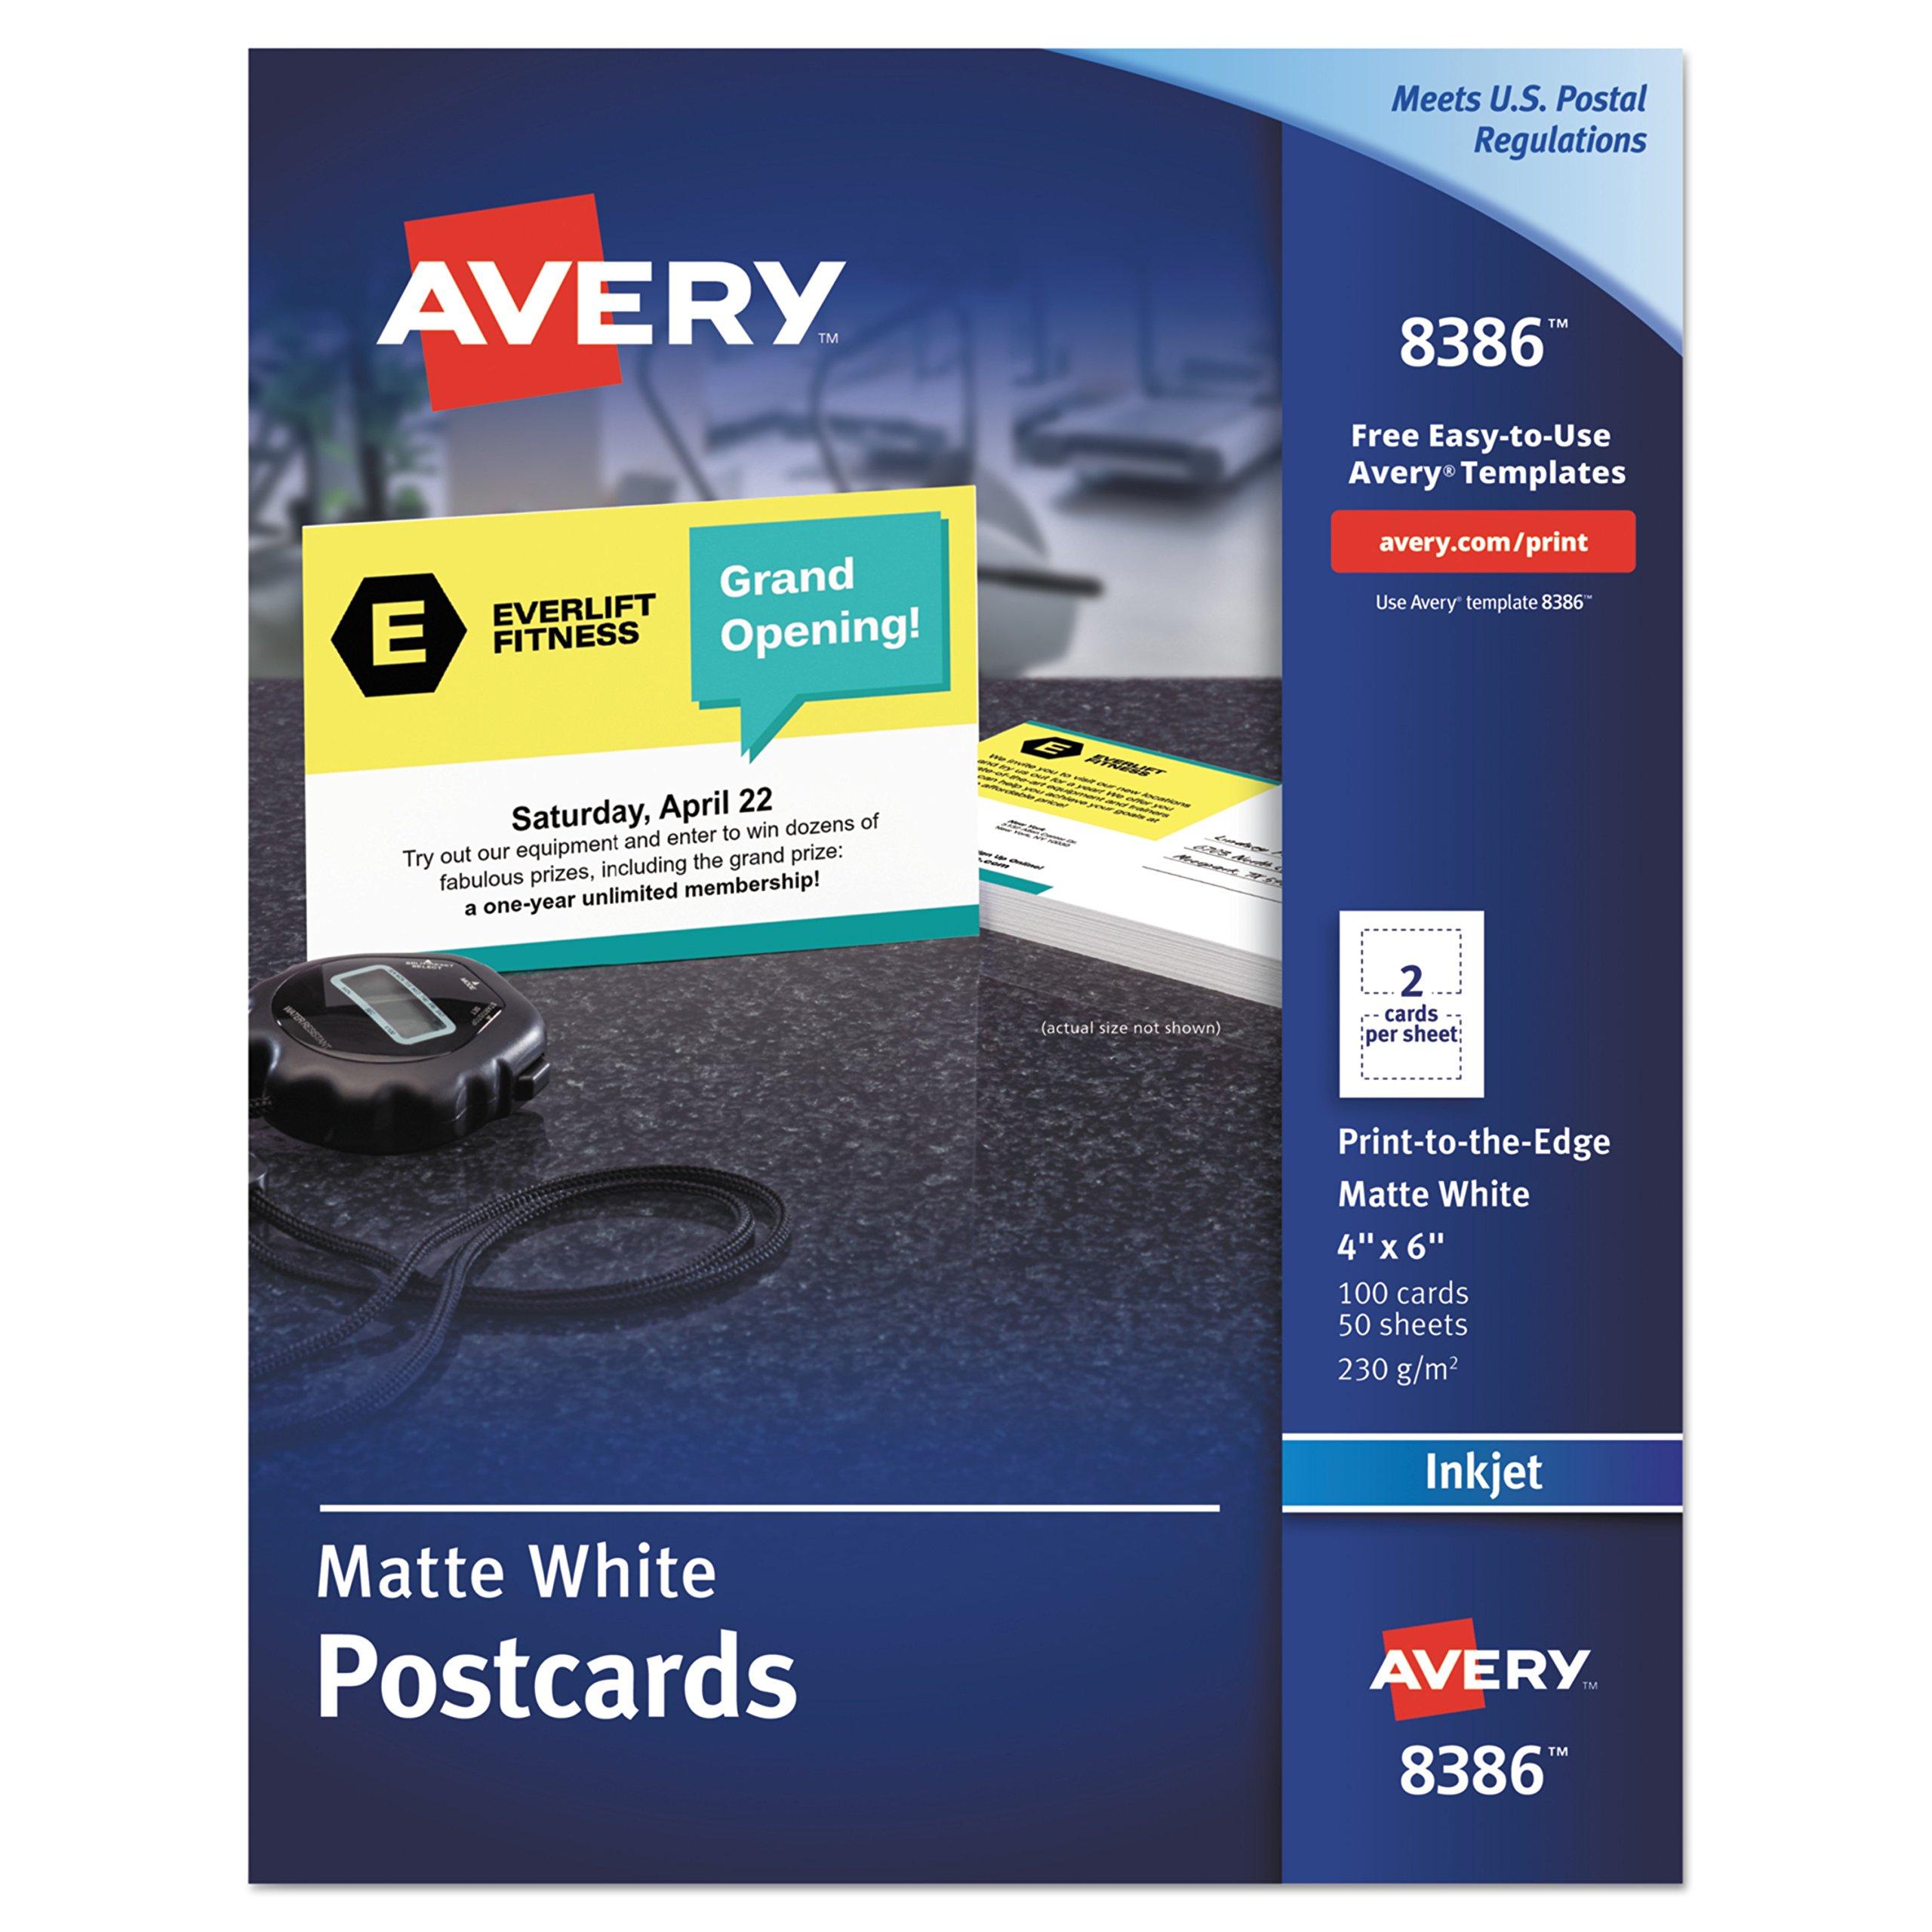 Avery 8386 Postcards, Inkjet, 4 x 6, 2 Cards/Sheet, White (Box of 100 Cards) by AVERY